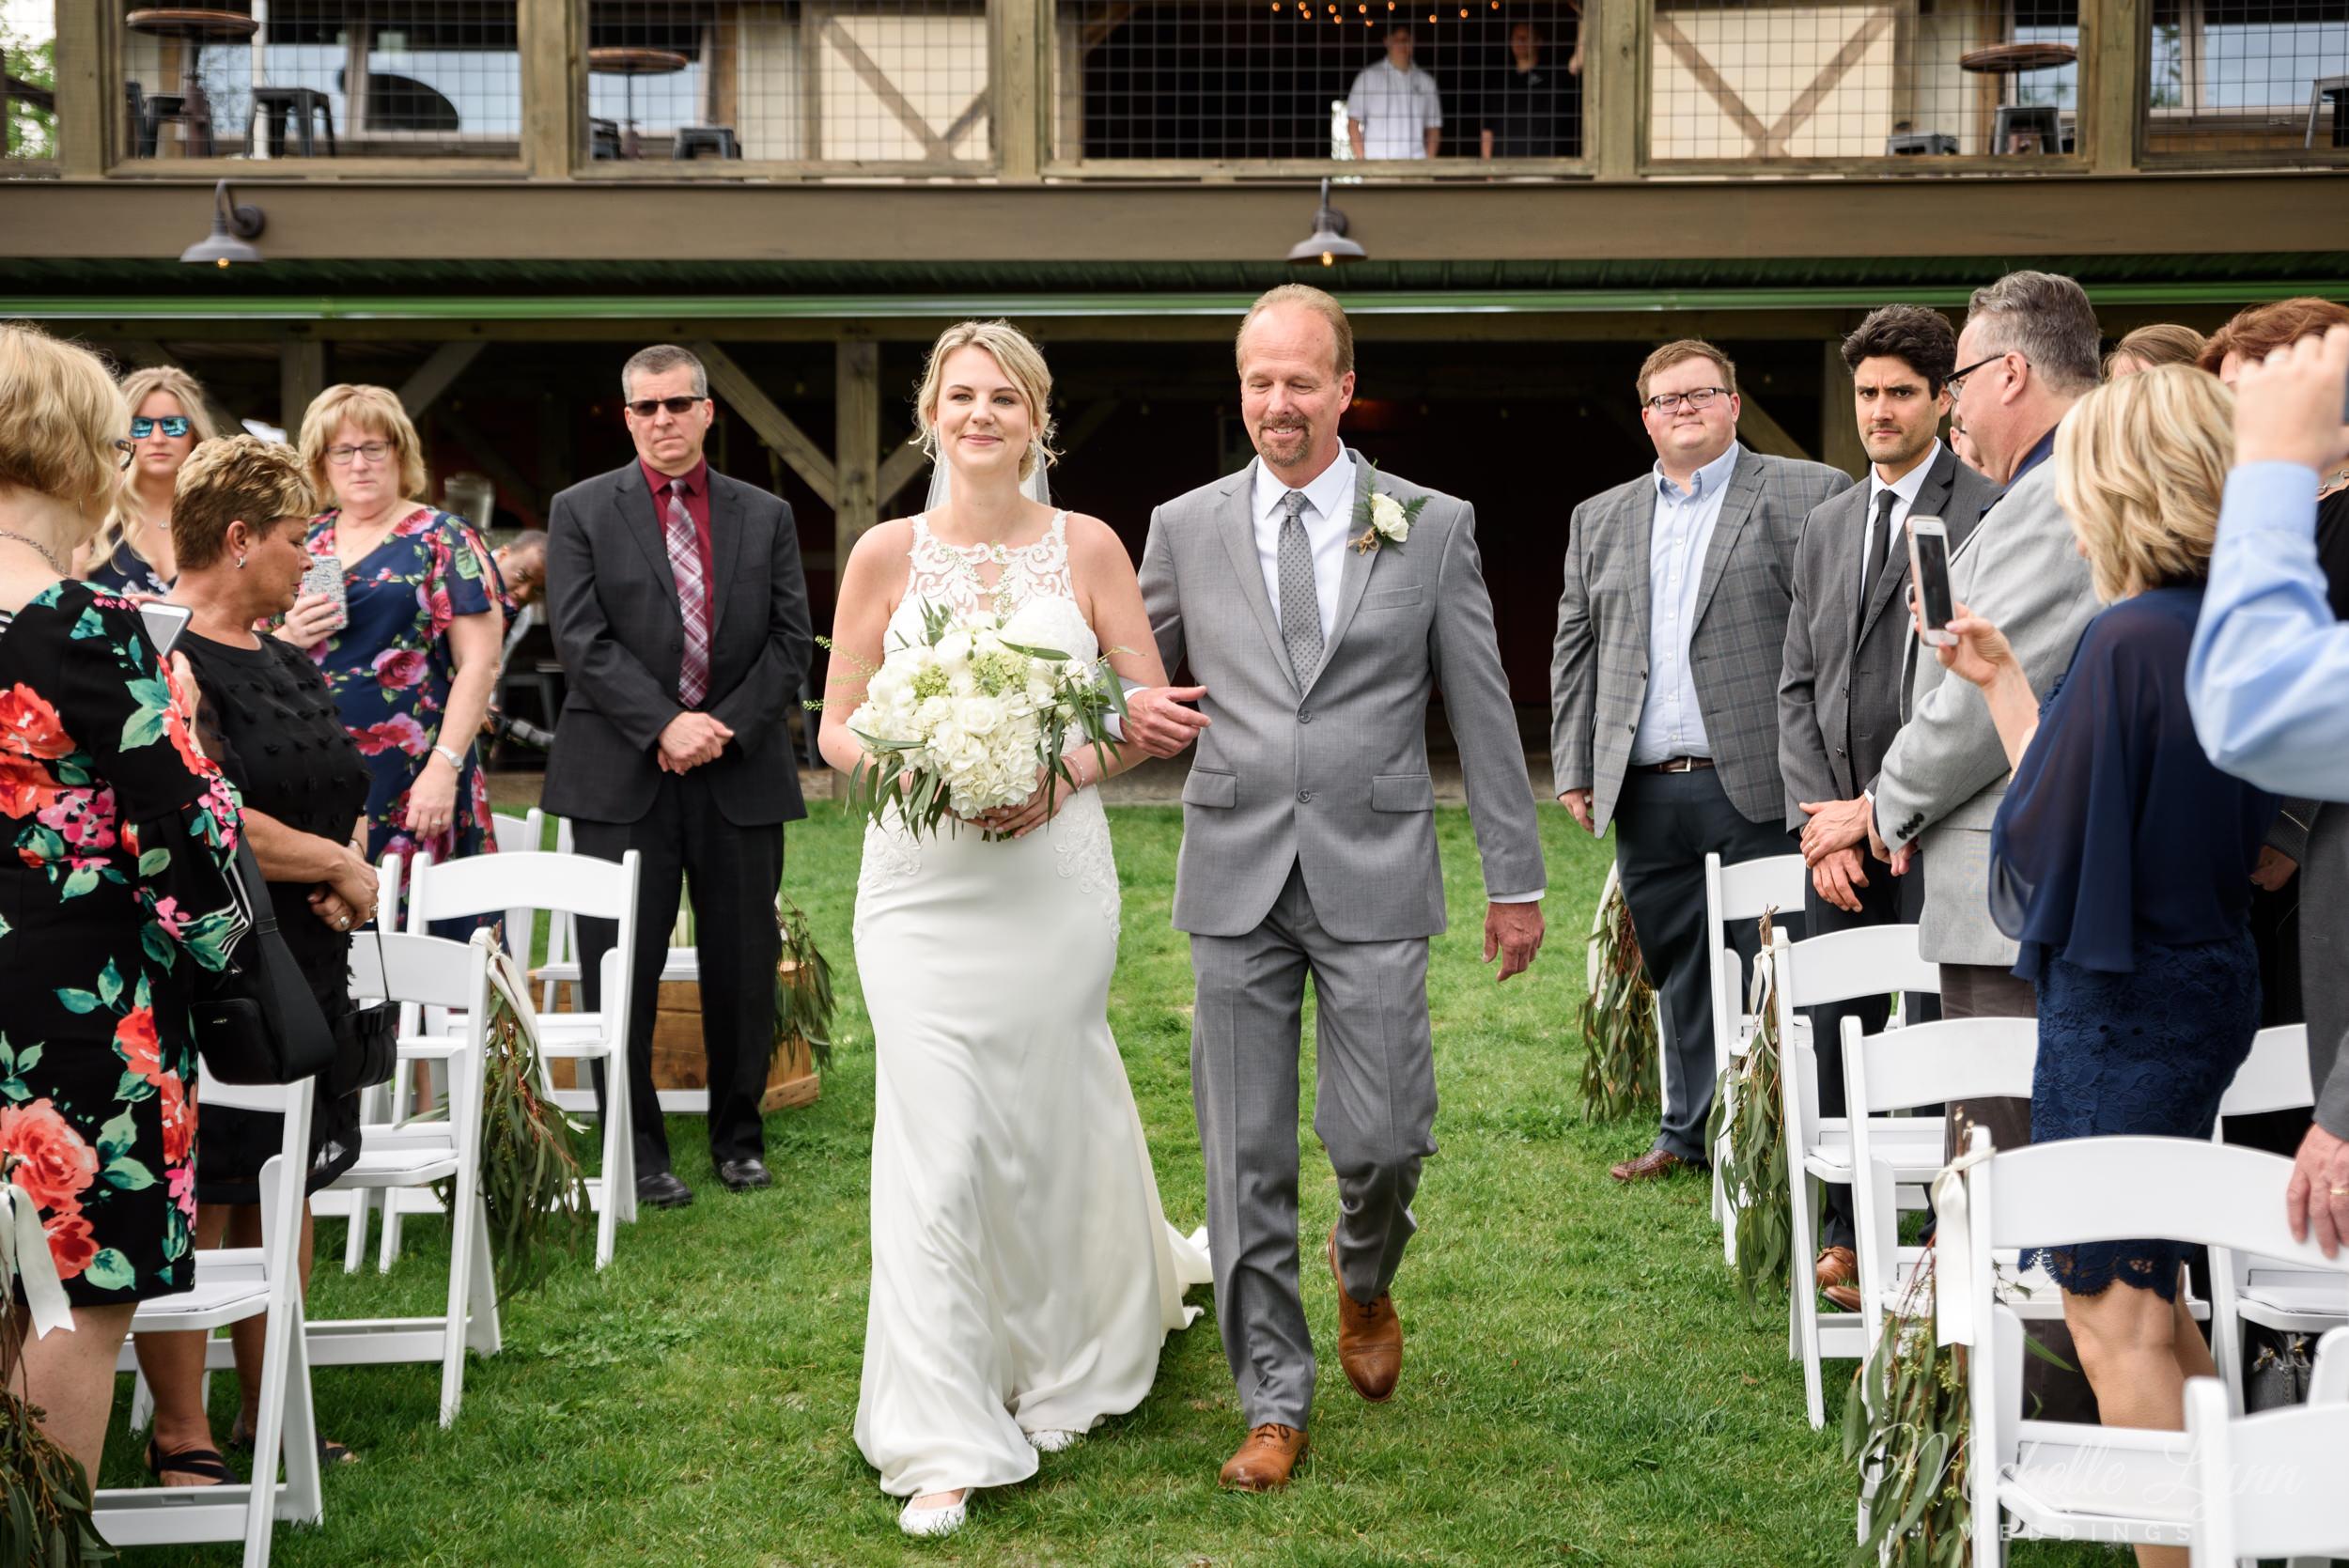 mlw-the-farm-bakery-and-events-wedding-photos-30.jpg